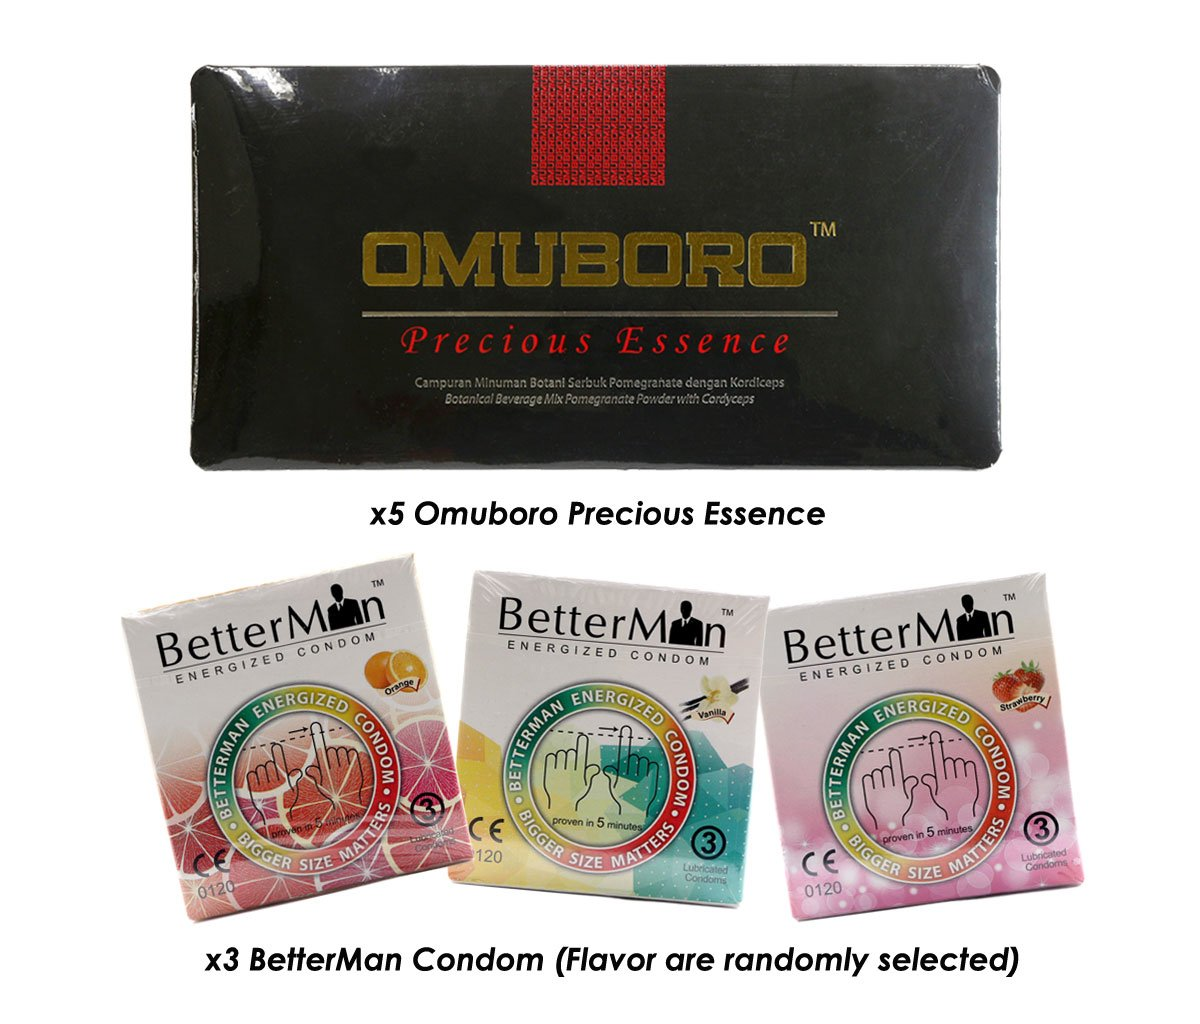 (5) Pack Omuboro Precious Essence with Butea Superba and Better Sex Erection Enhancer + Free (3) Box BetterMan Anion Energized Condom